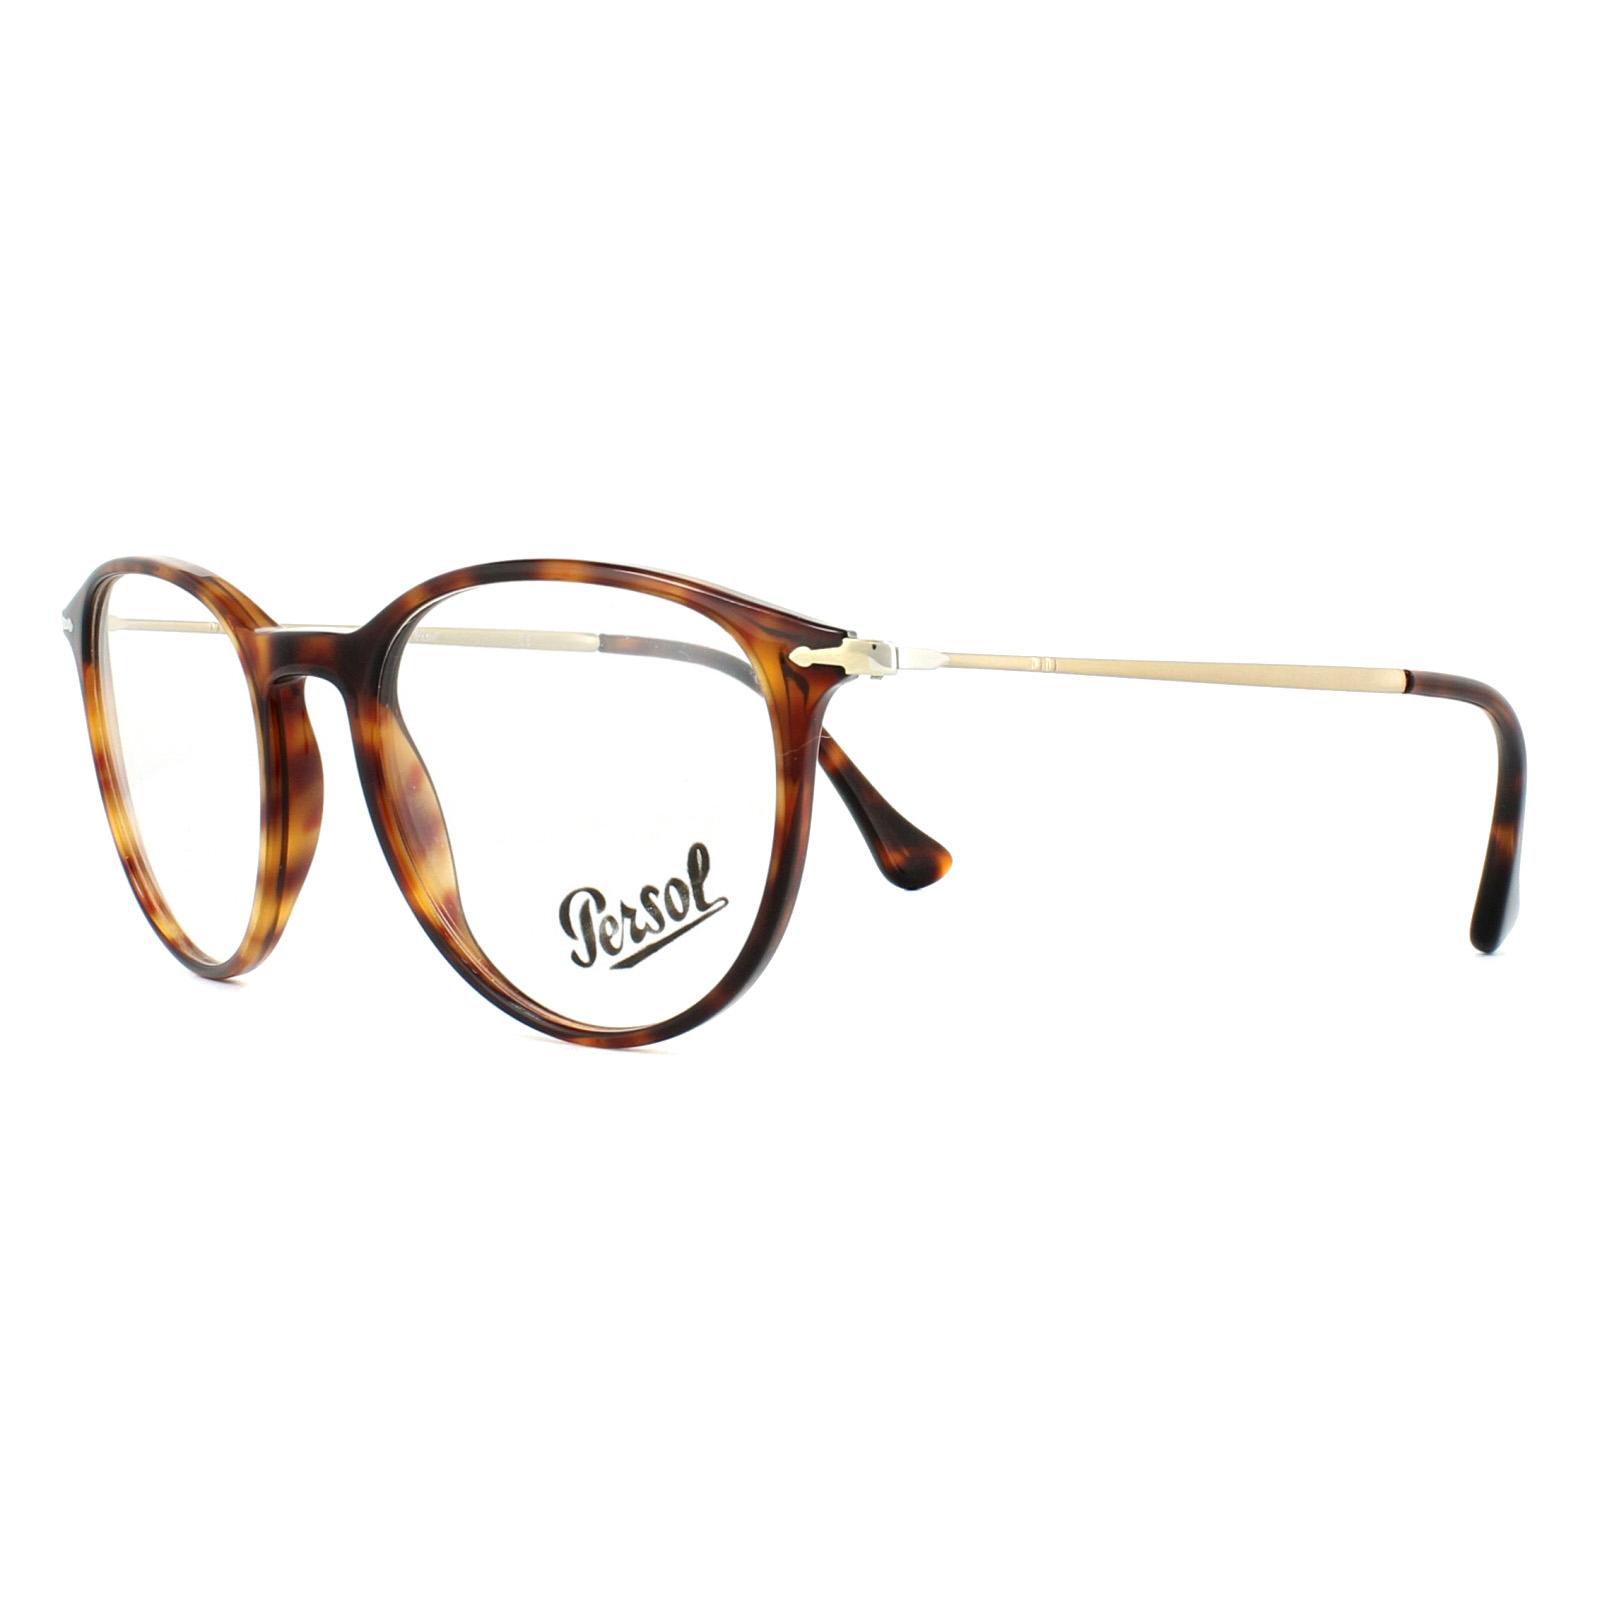 9e5fde5e735 Persol Glasses Frames PO3147V 24 Havana 48mm Mens 8053672594270